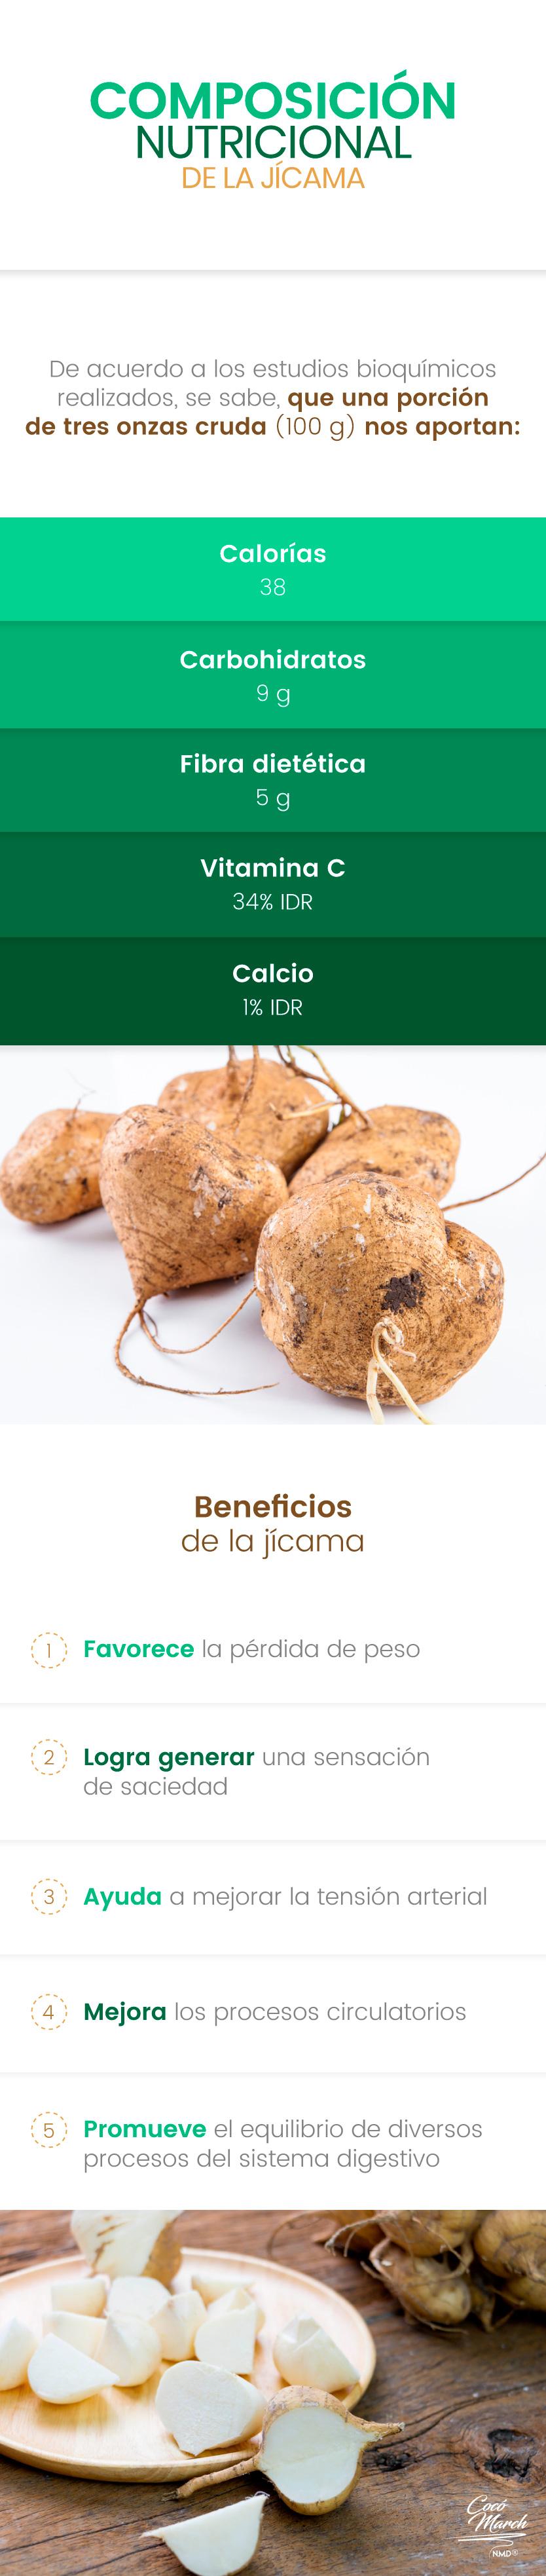 jicama-composicion-nutricional